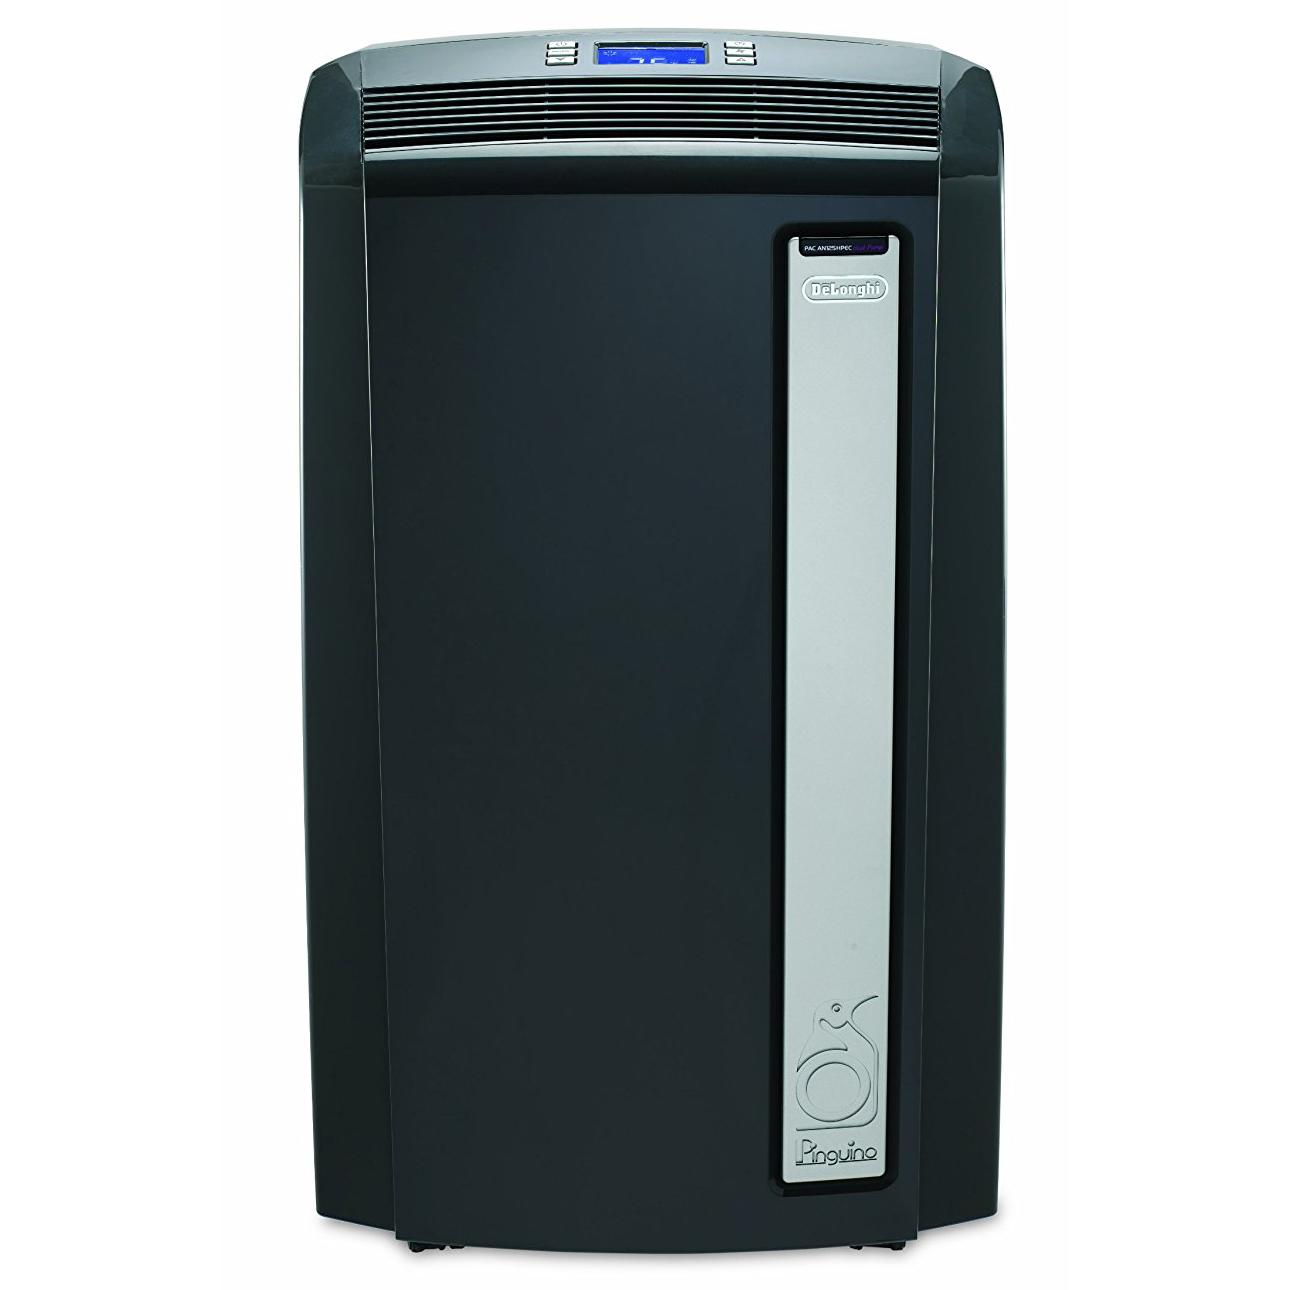 DeLonghi Portable 12,500 BTU Air Conditioner (Manufacturer Refurbished 7e34c009a297